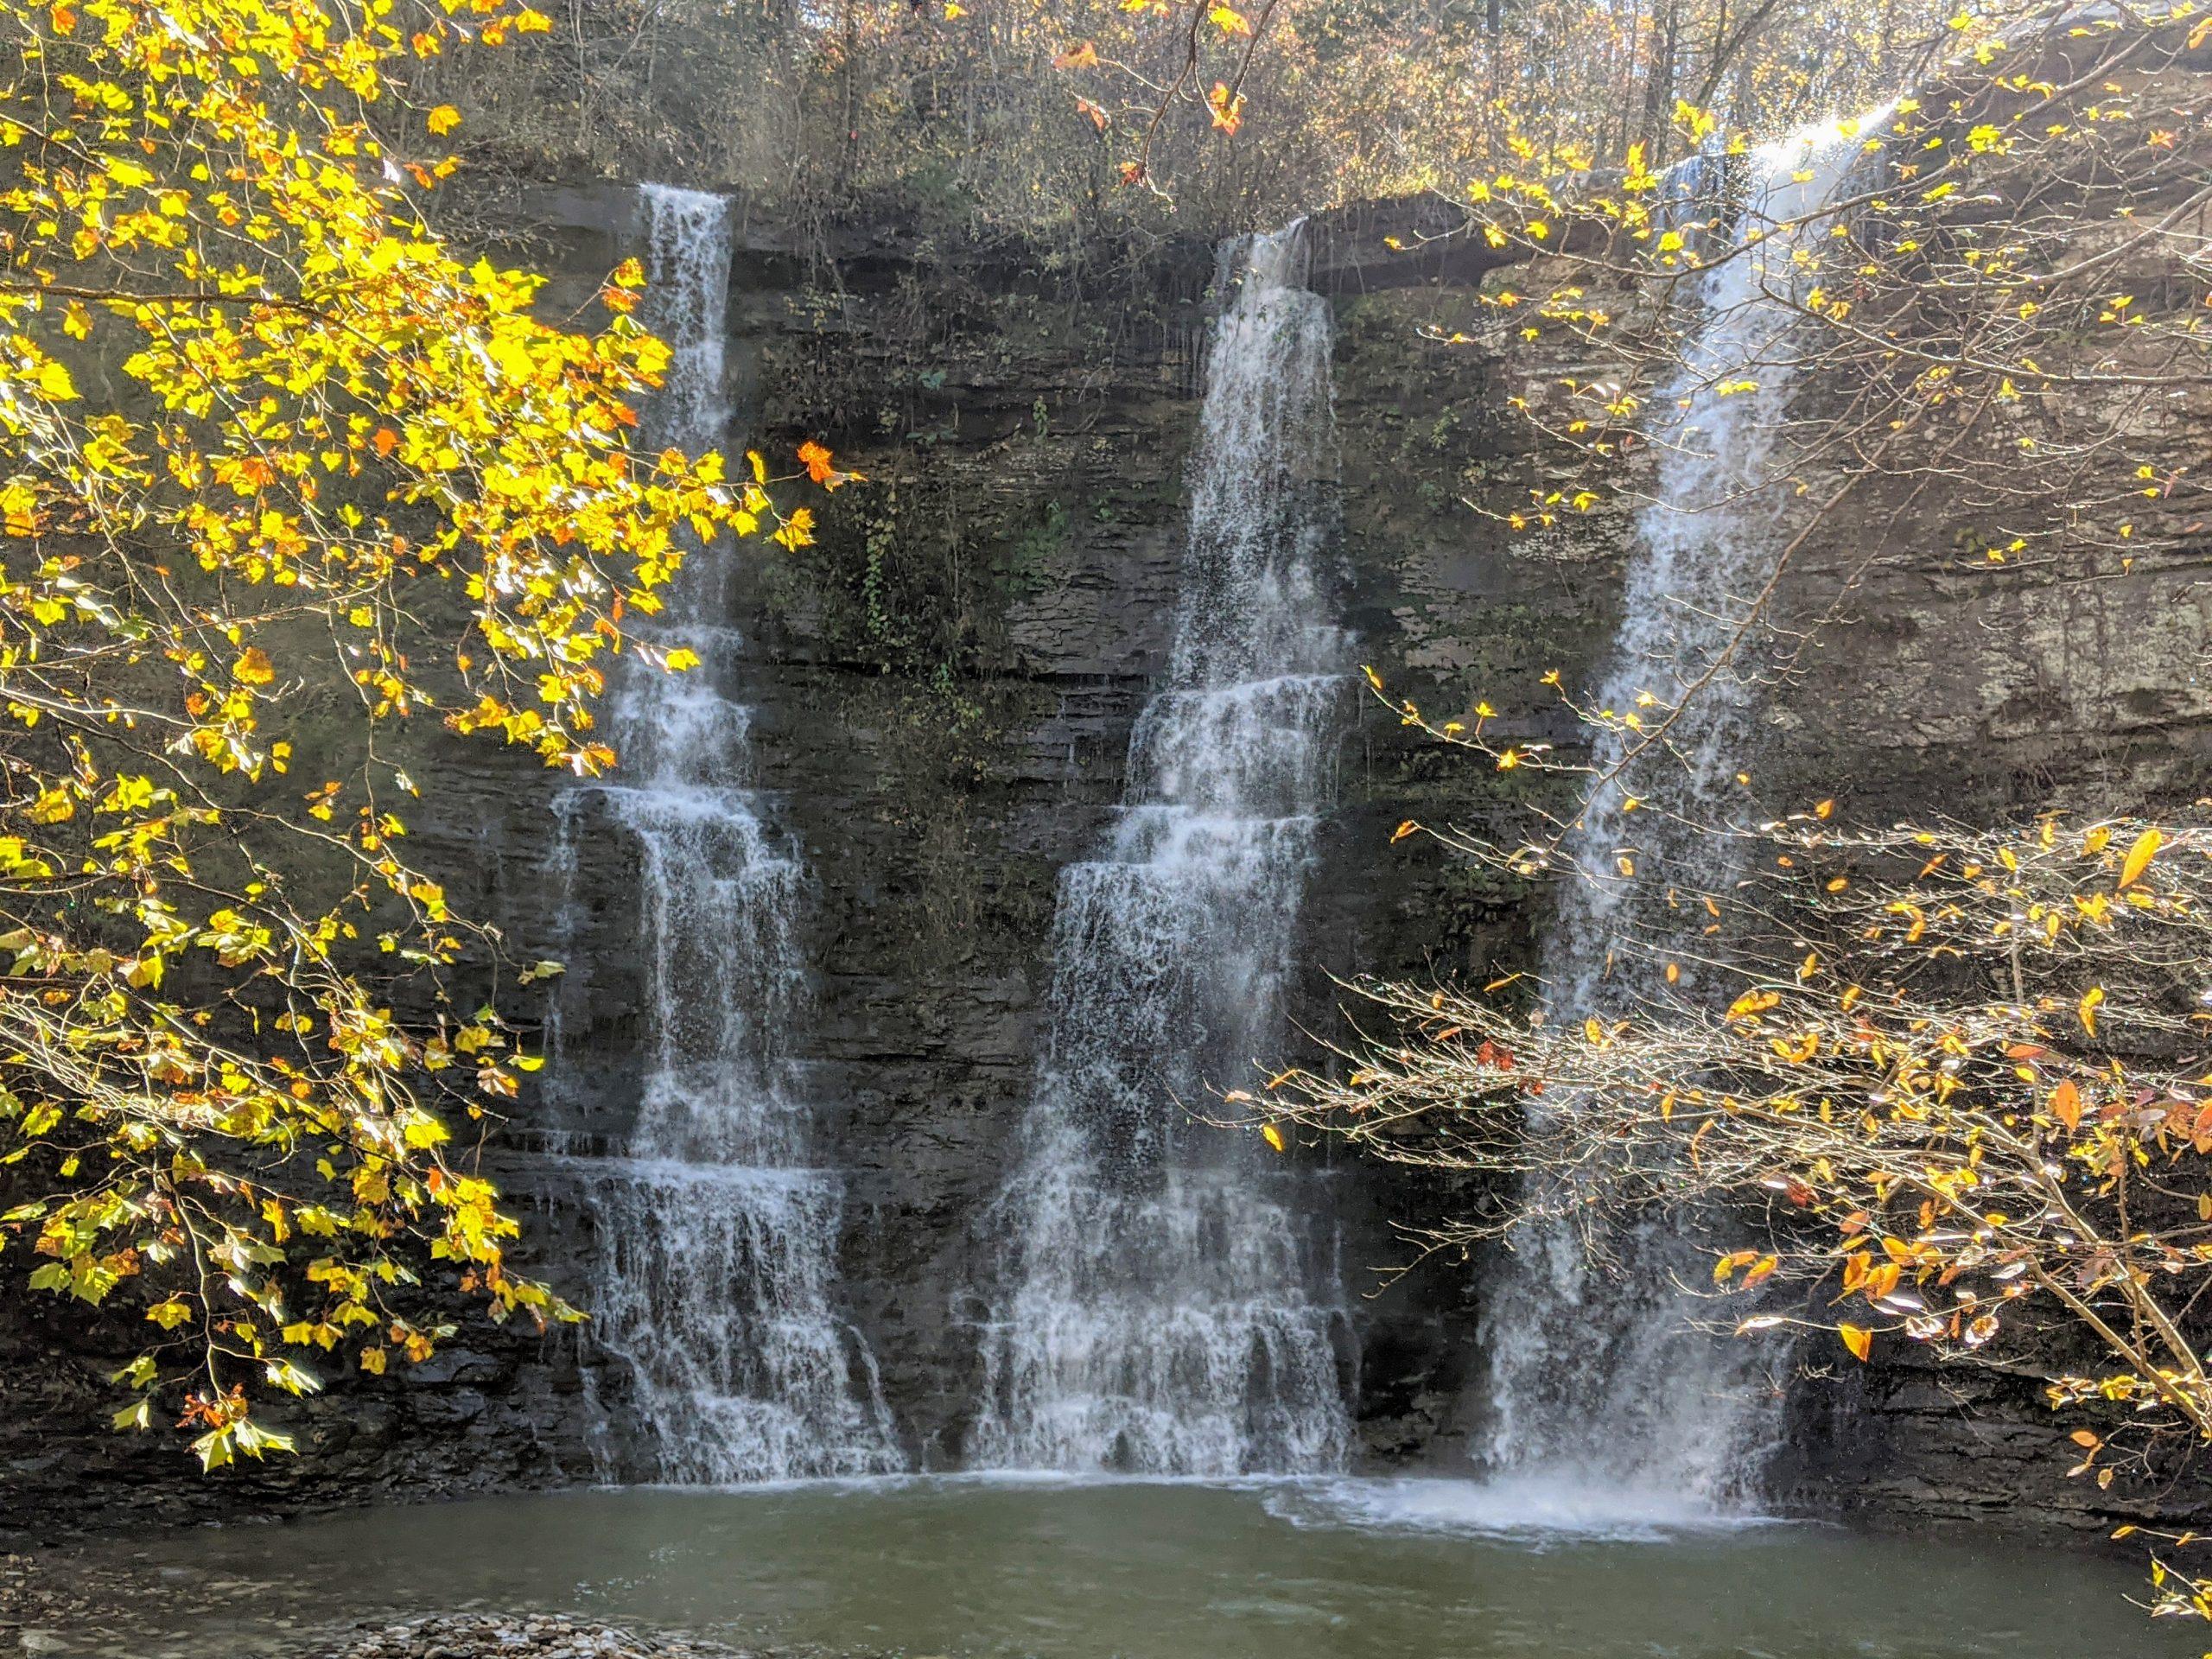 triple falls at camp orr near buffalo national river